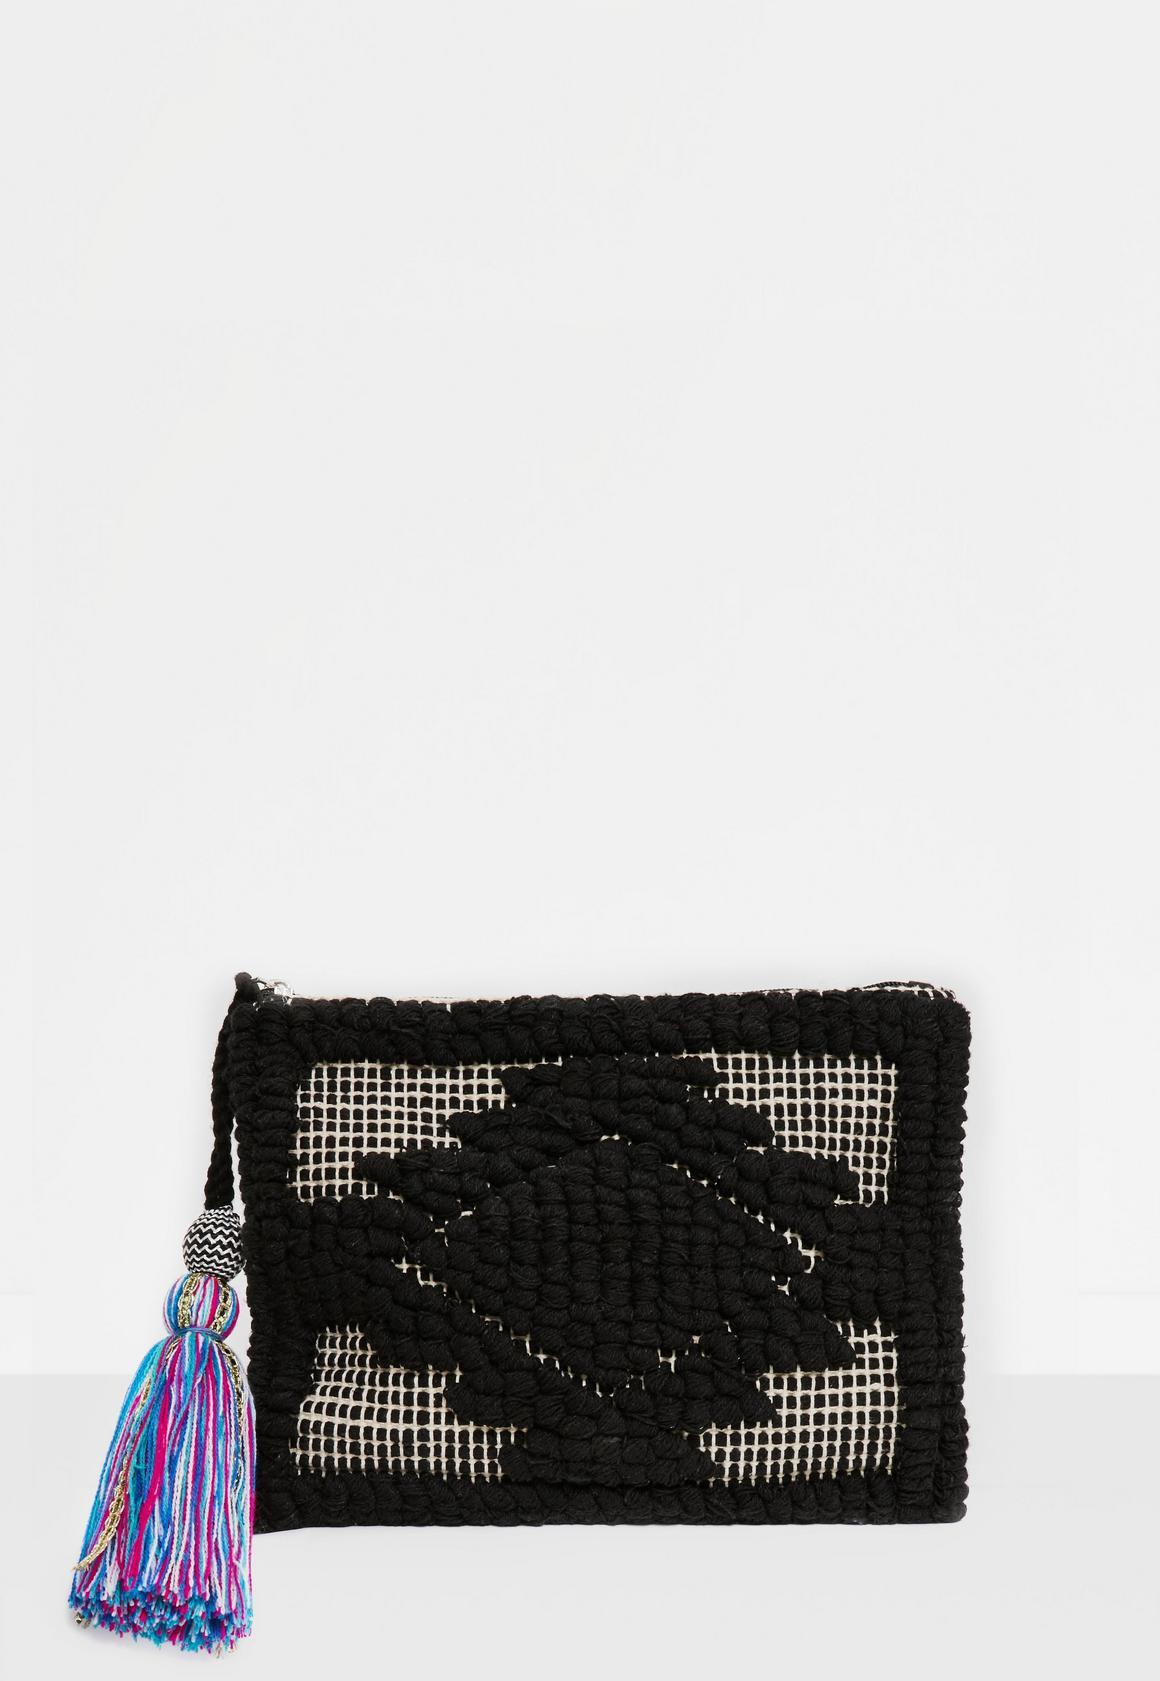 Clutch Bags - Black, White & Khaki   Missguided